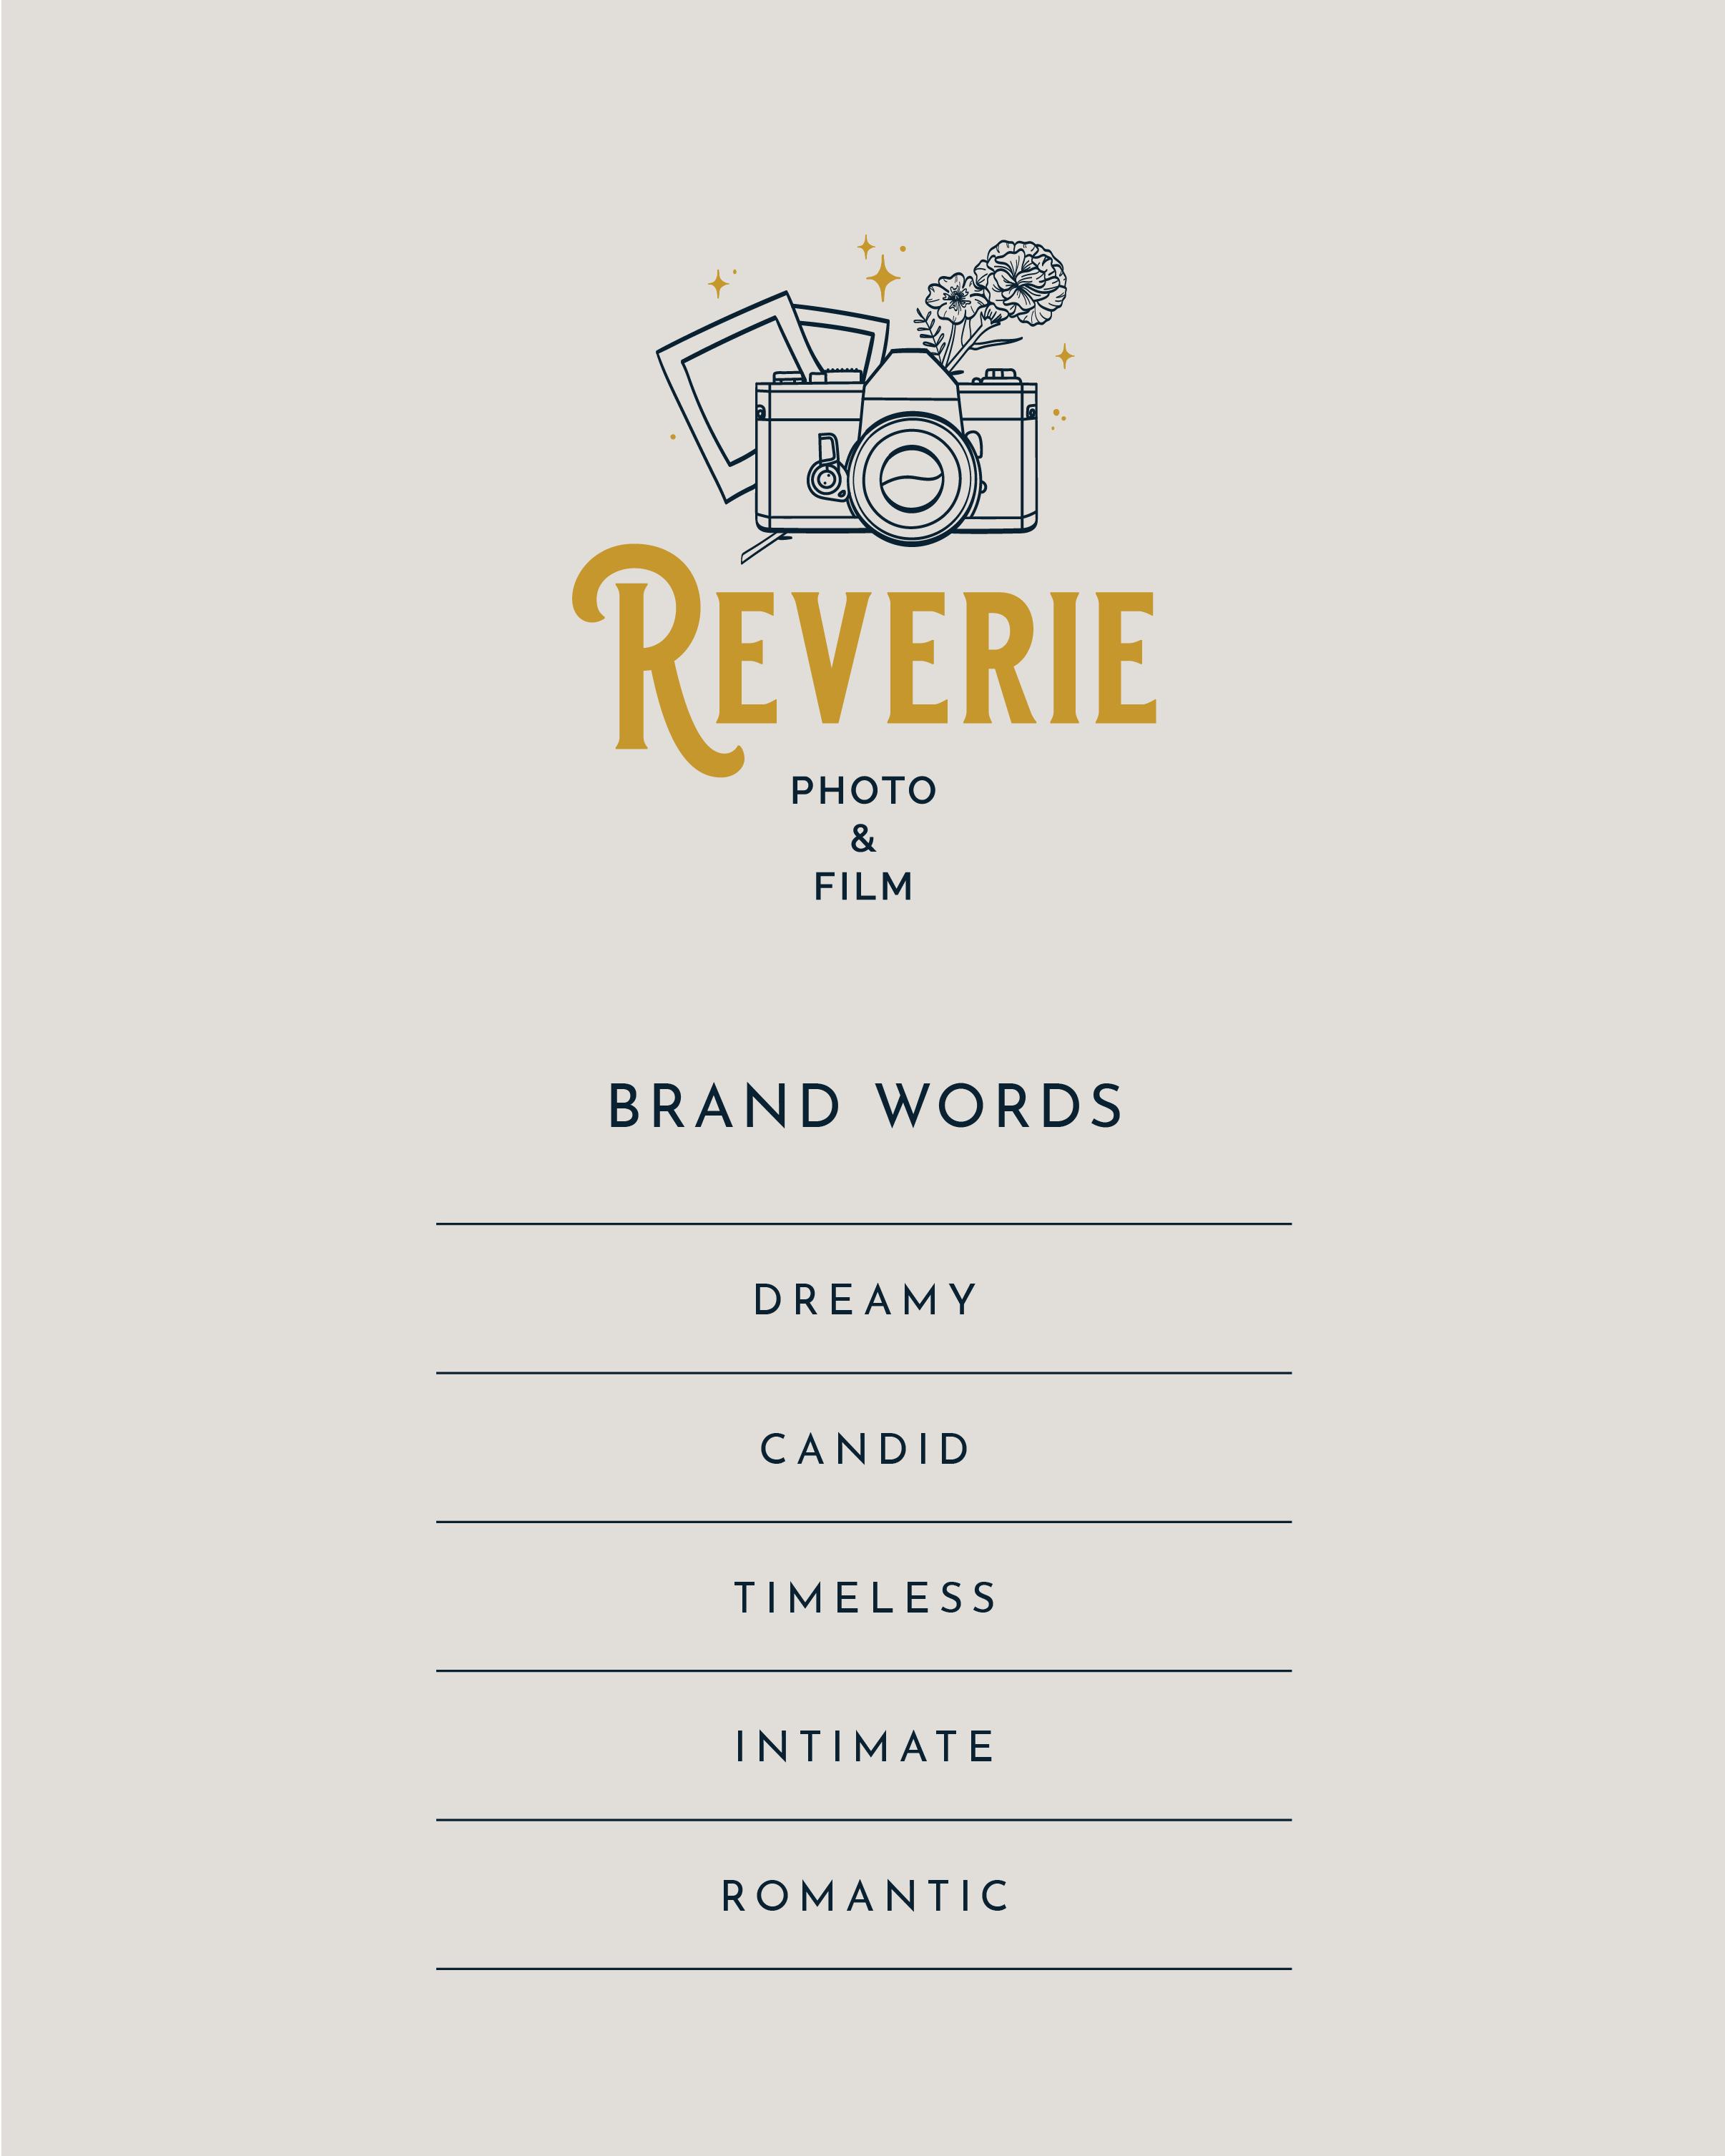 Reverie_Portfolio_BrandWords.png